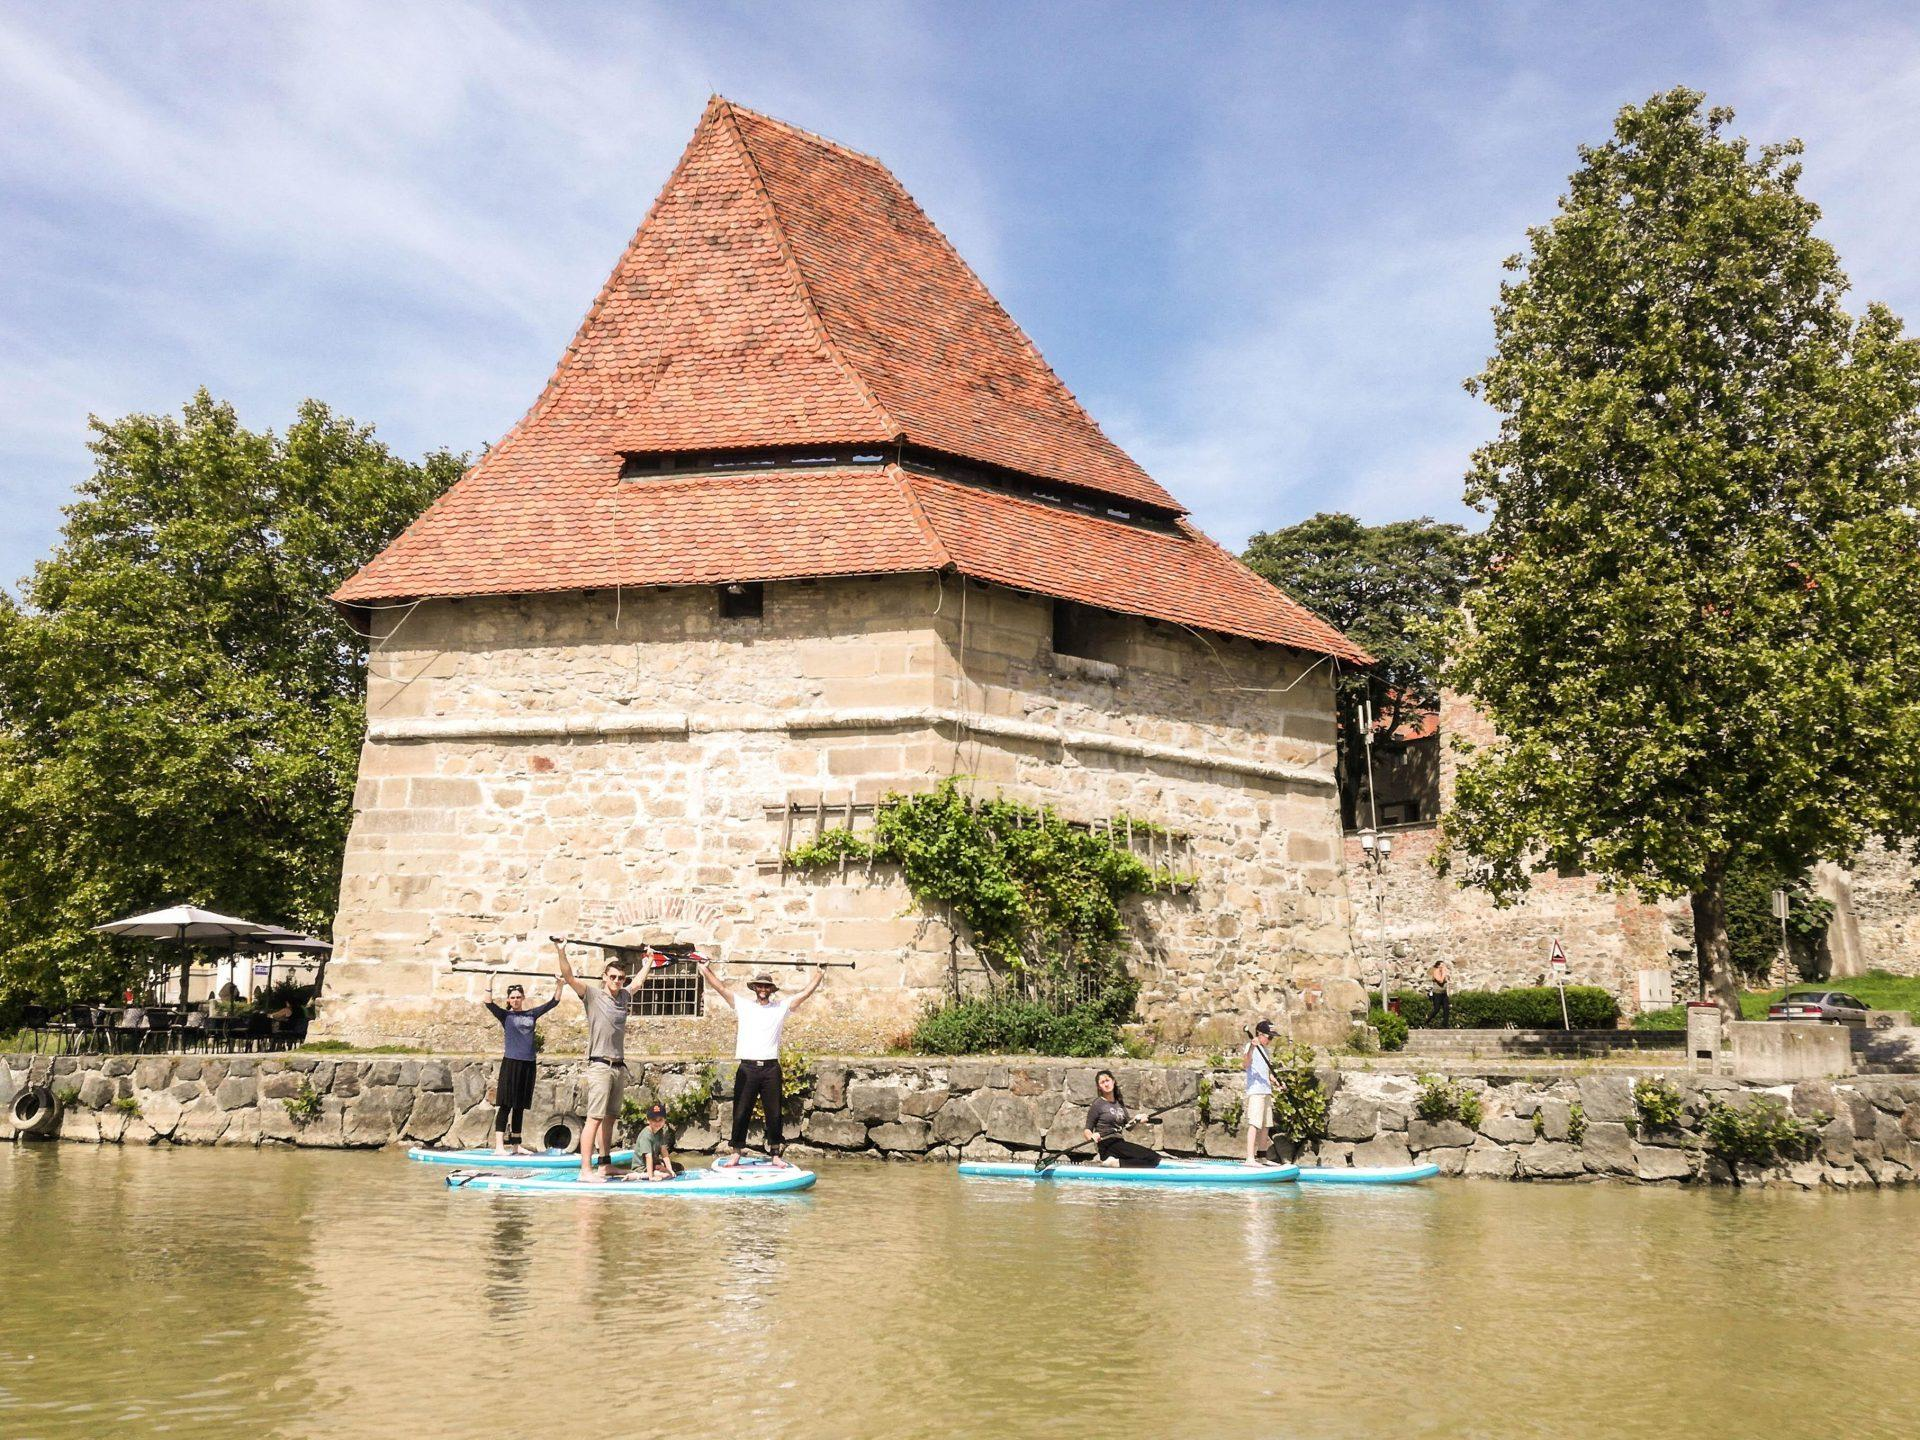 Paddle boarding tour Maribor, Slovenia